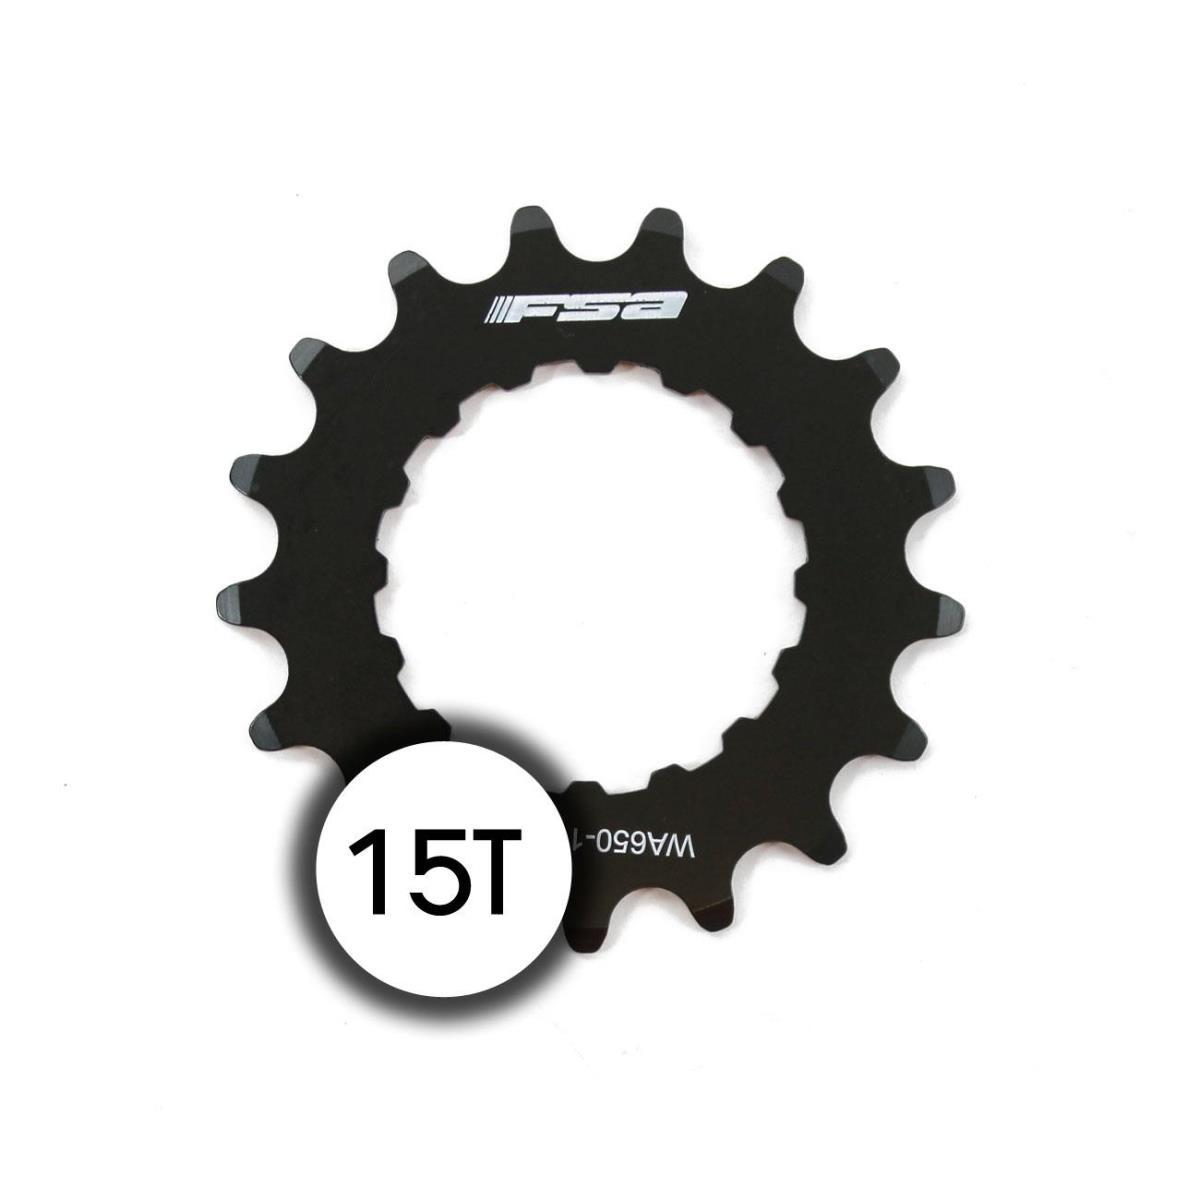 sprocket 15t bosch ebike chainring wa648 stainless steel black